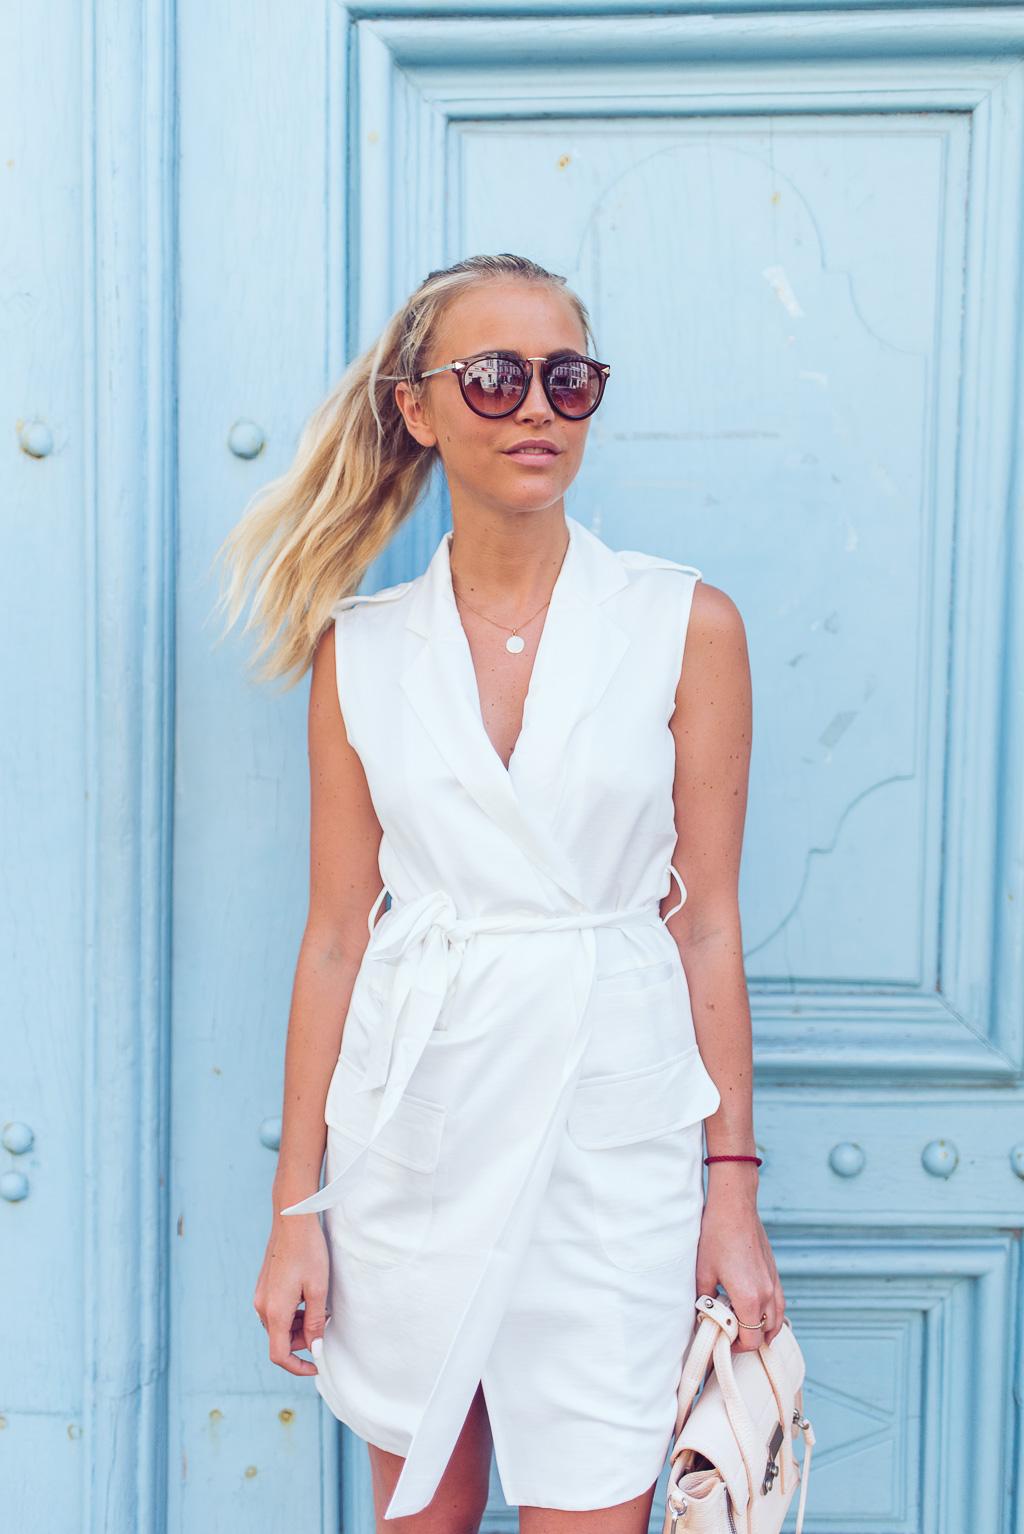 janni-deler-white-dress-victoriafornellyDSC_6428